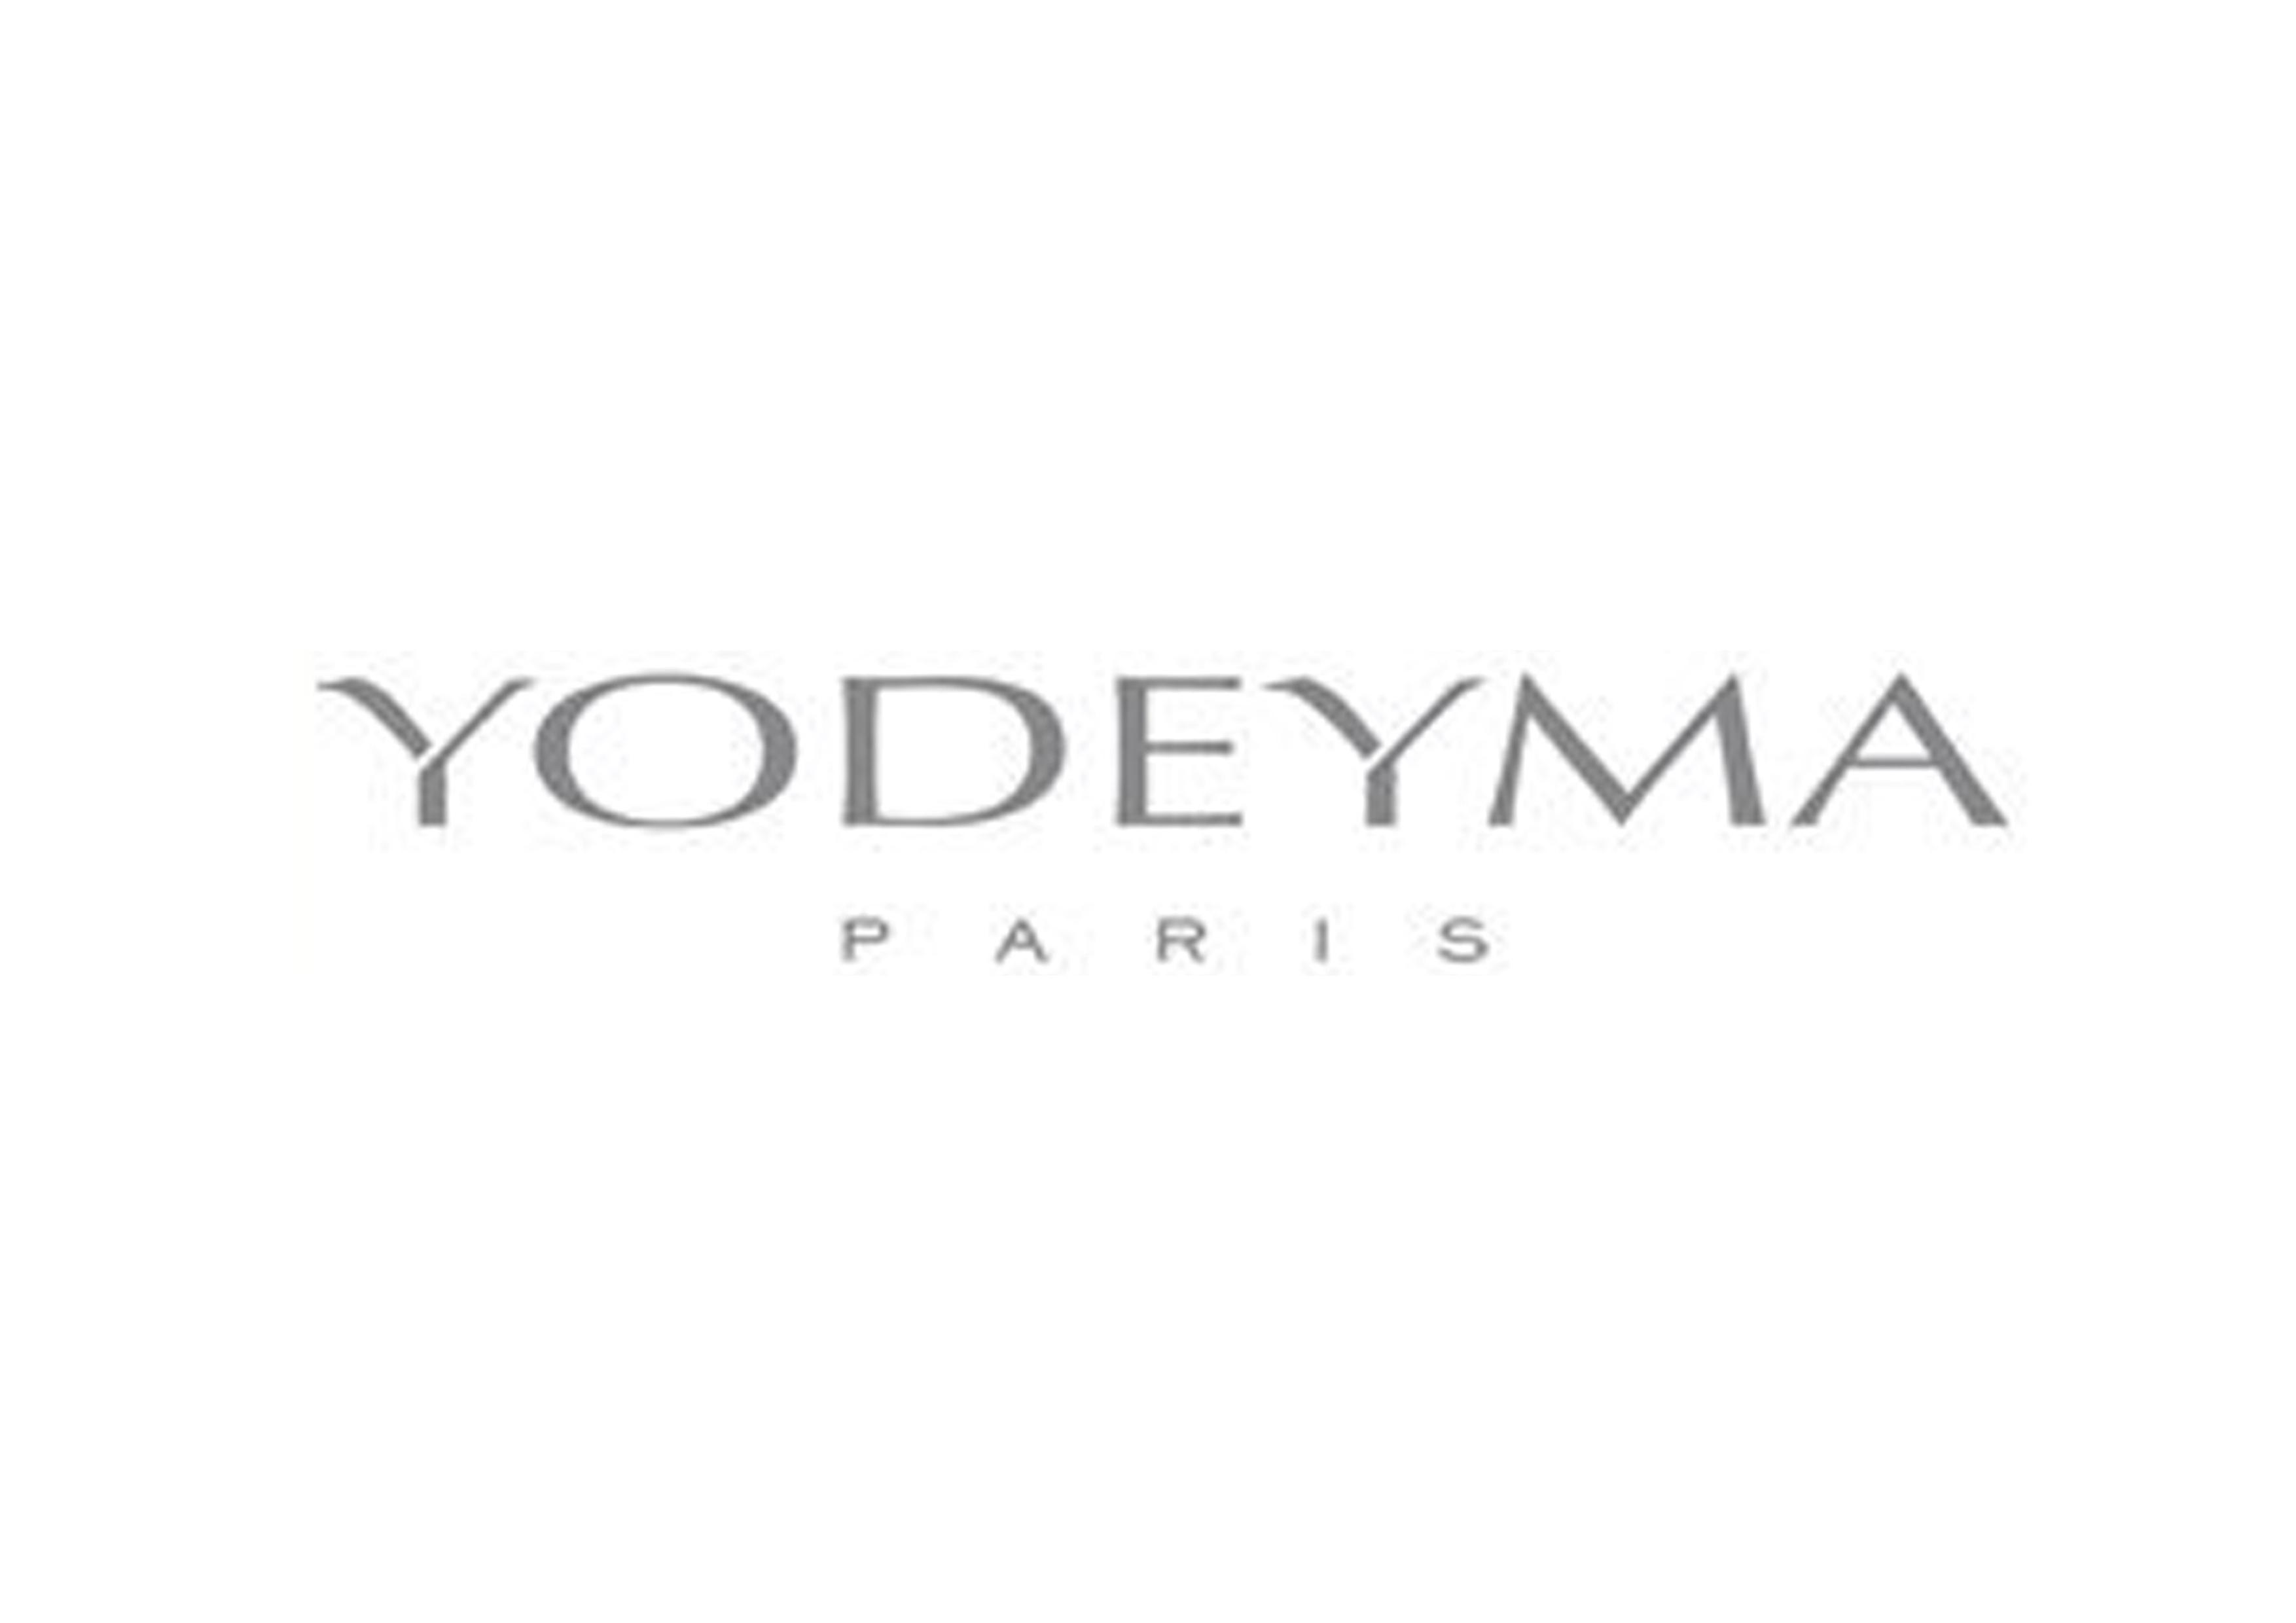 yodeyma-logo